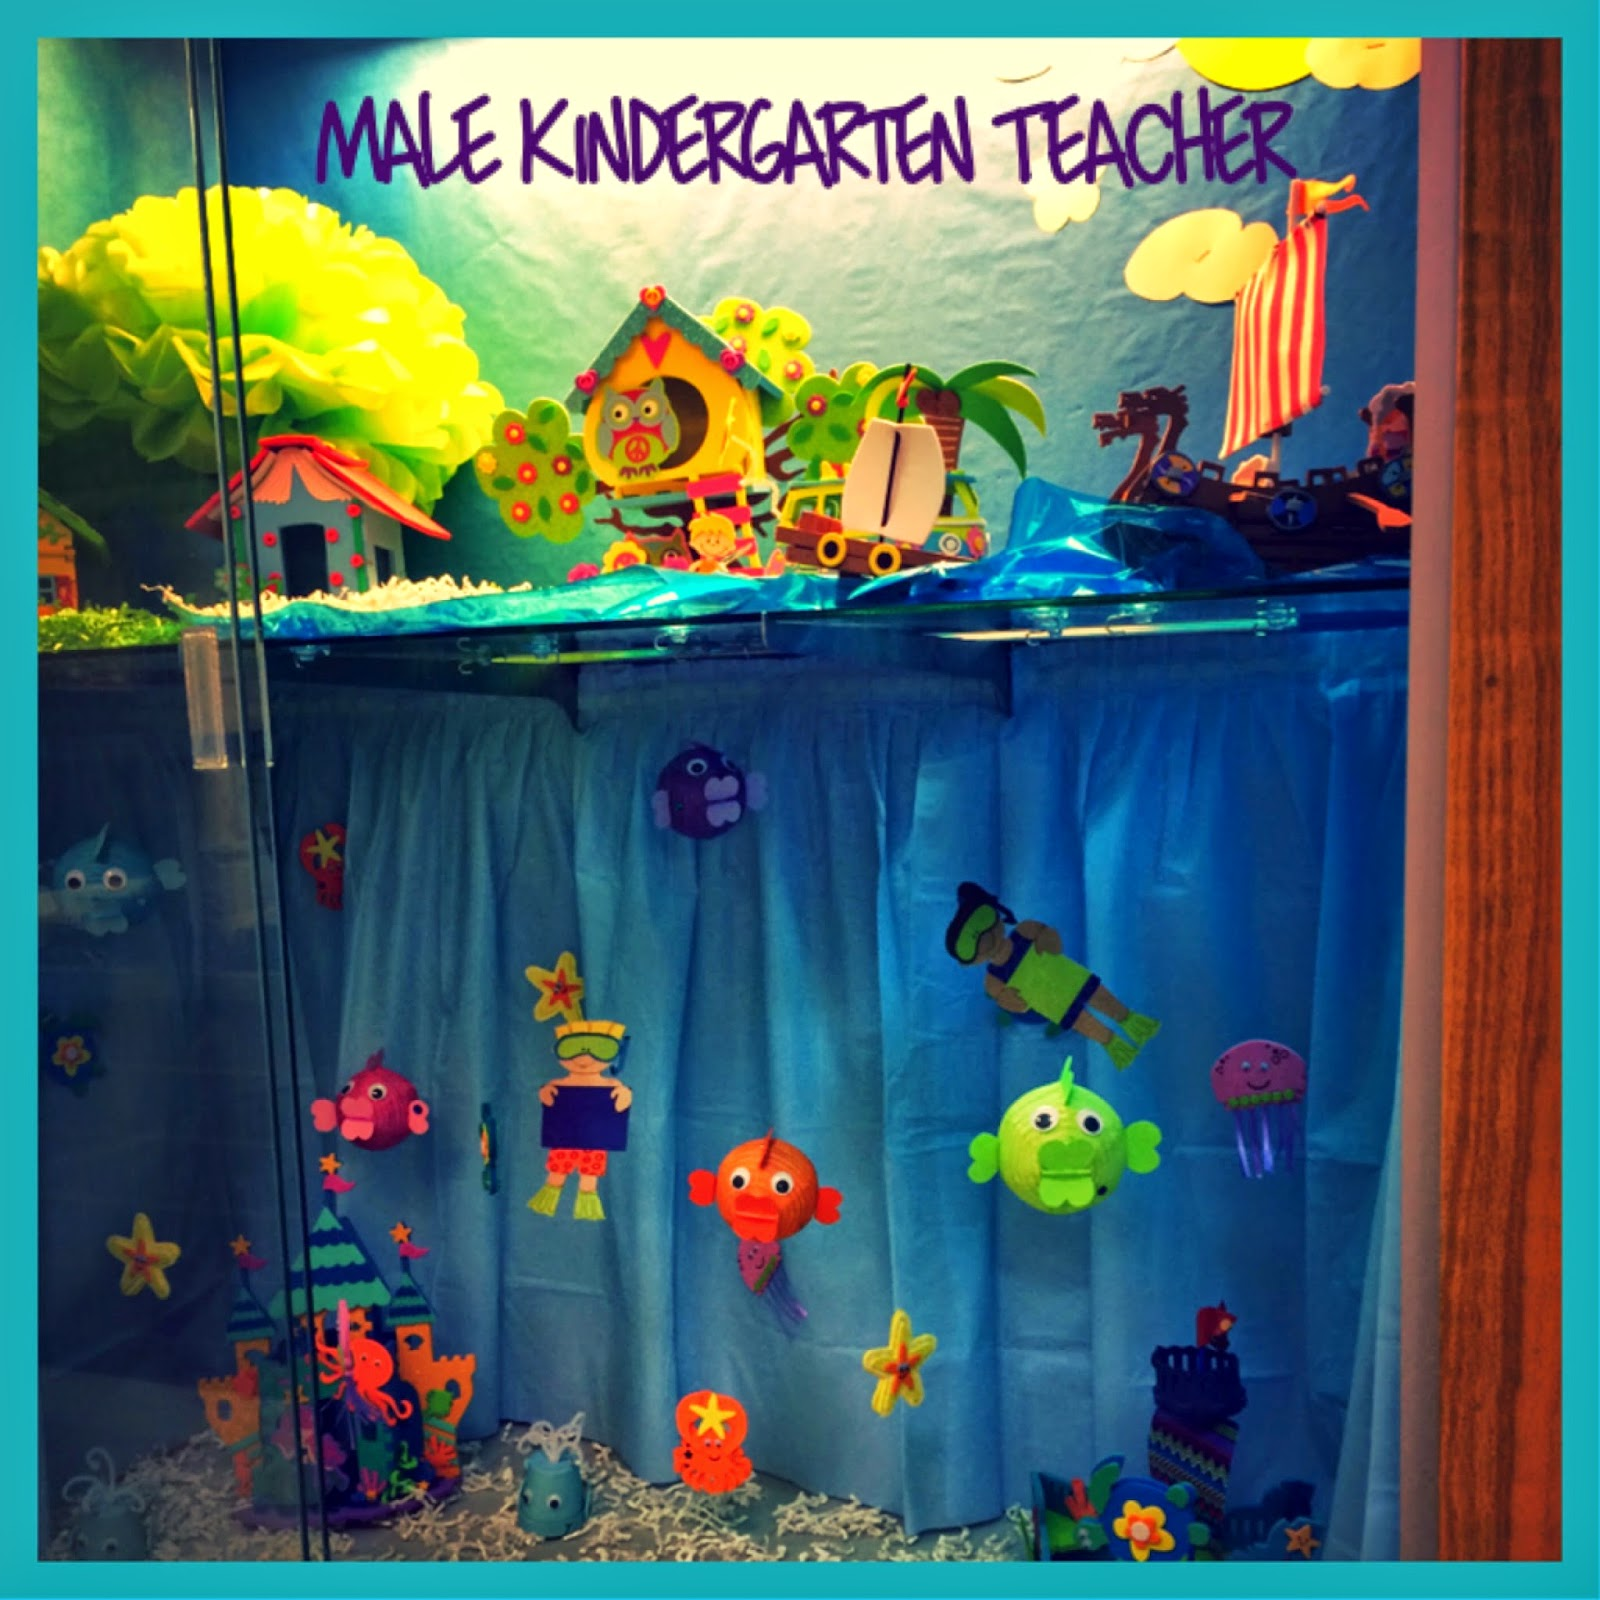 Classroom Decoration Kindergarten ~ Male kindergarten teacher under the sea into a b